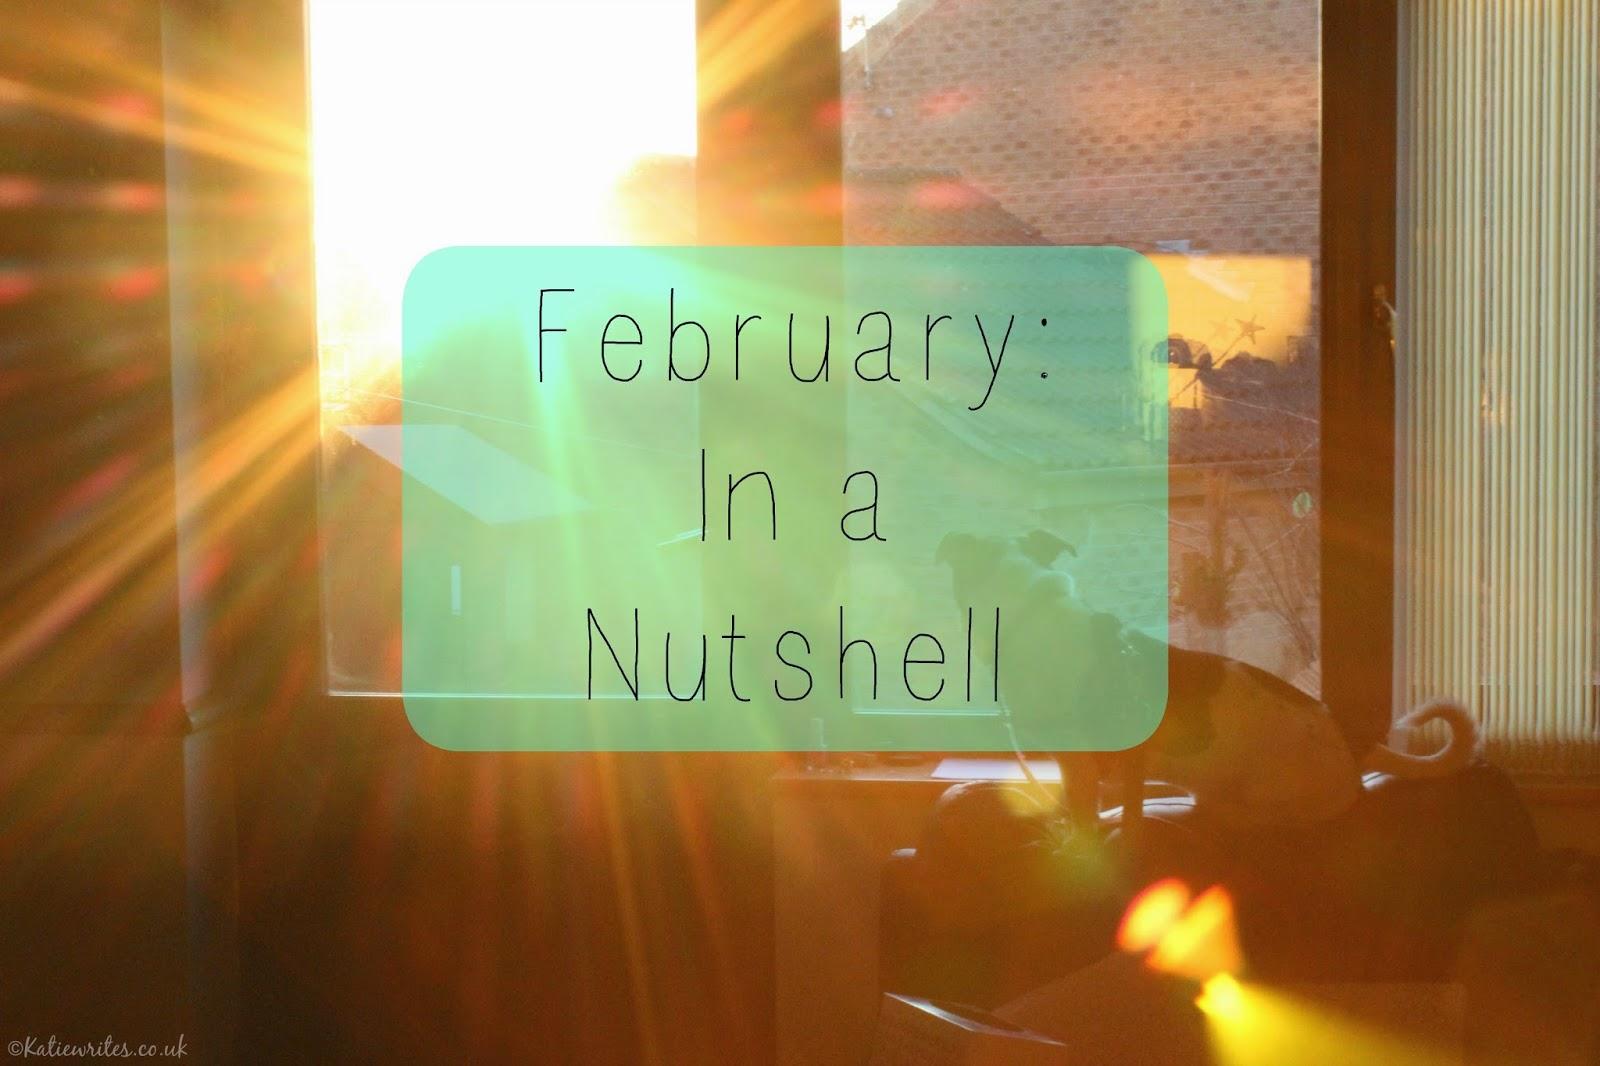 February: In a Nutshell